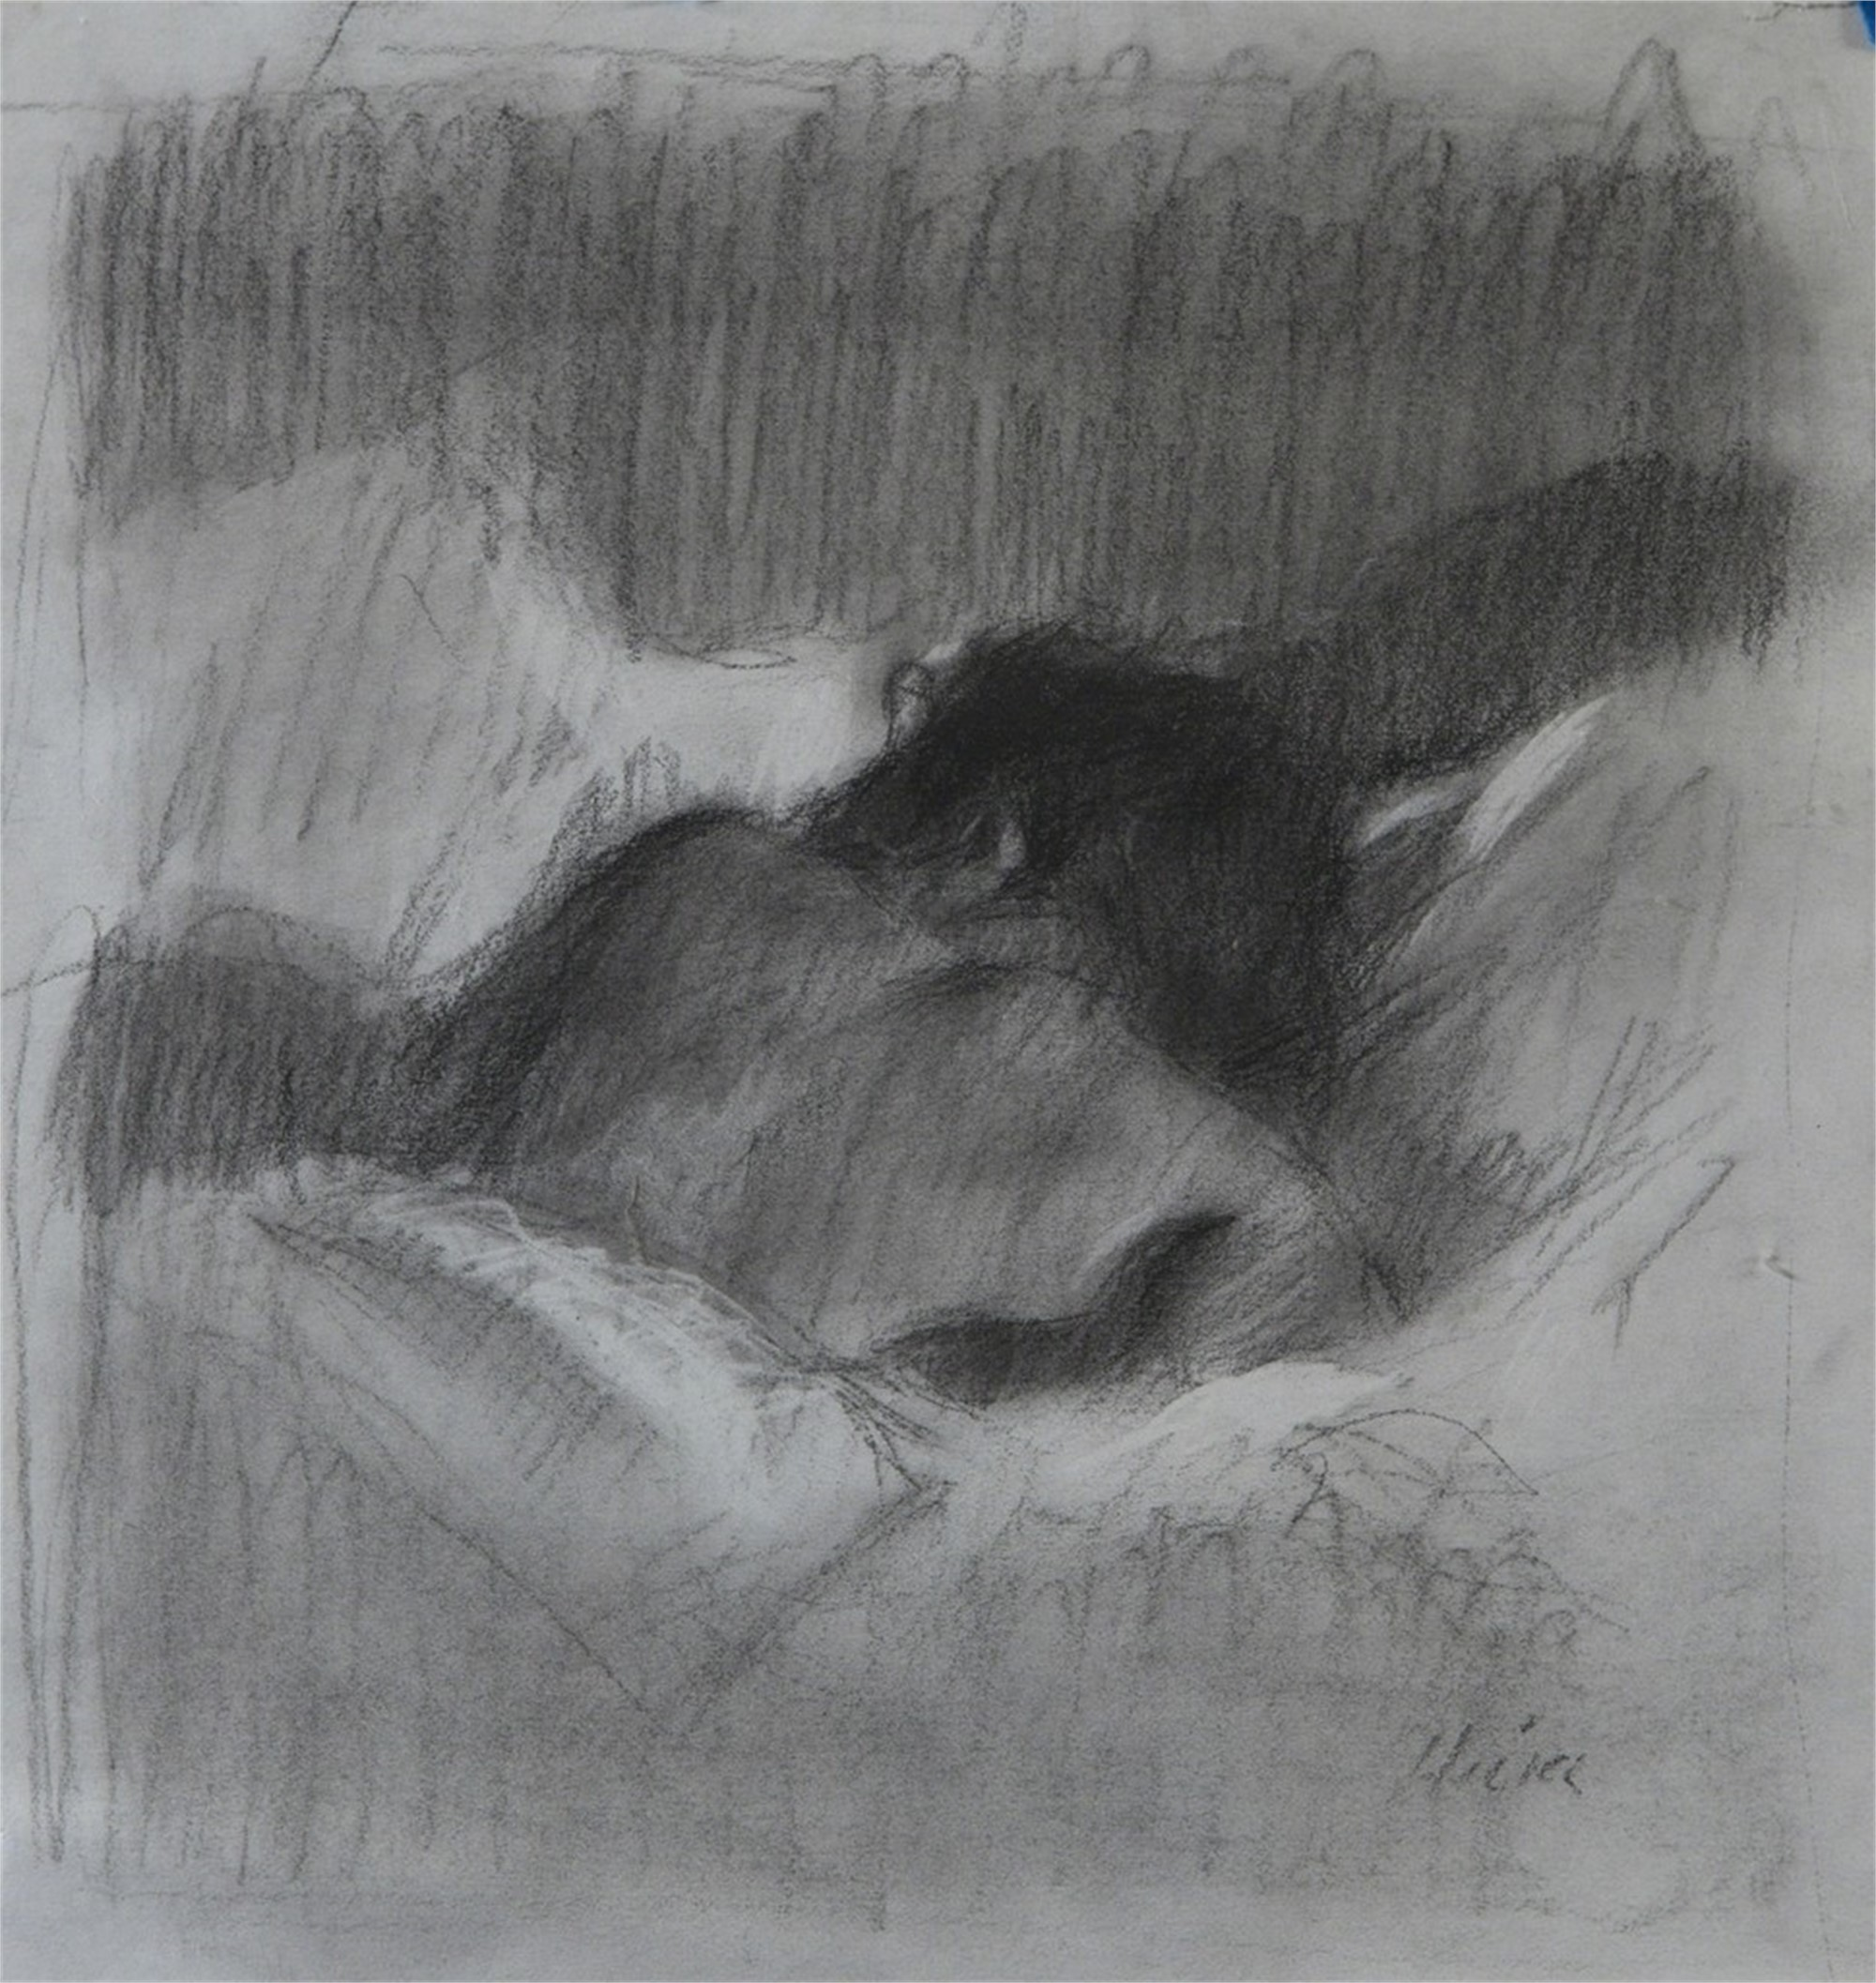 Sharon Sleeping by Ron Hicks